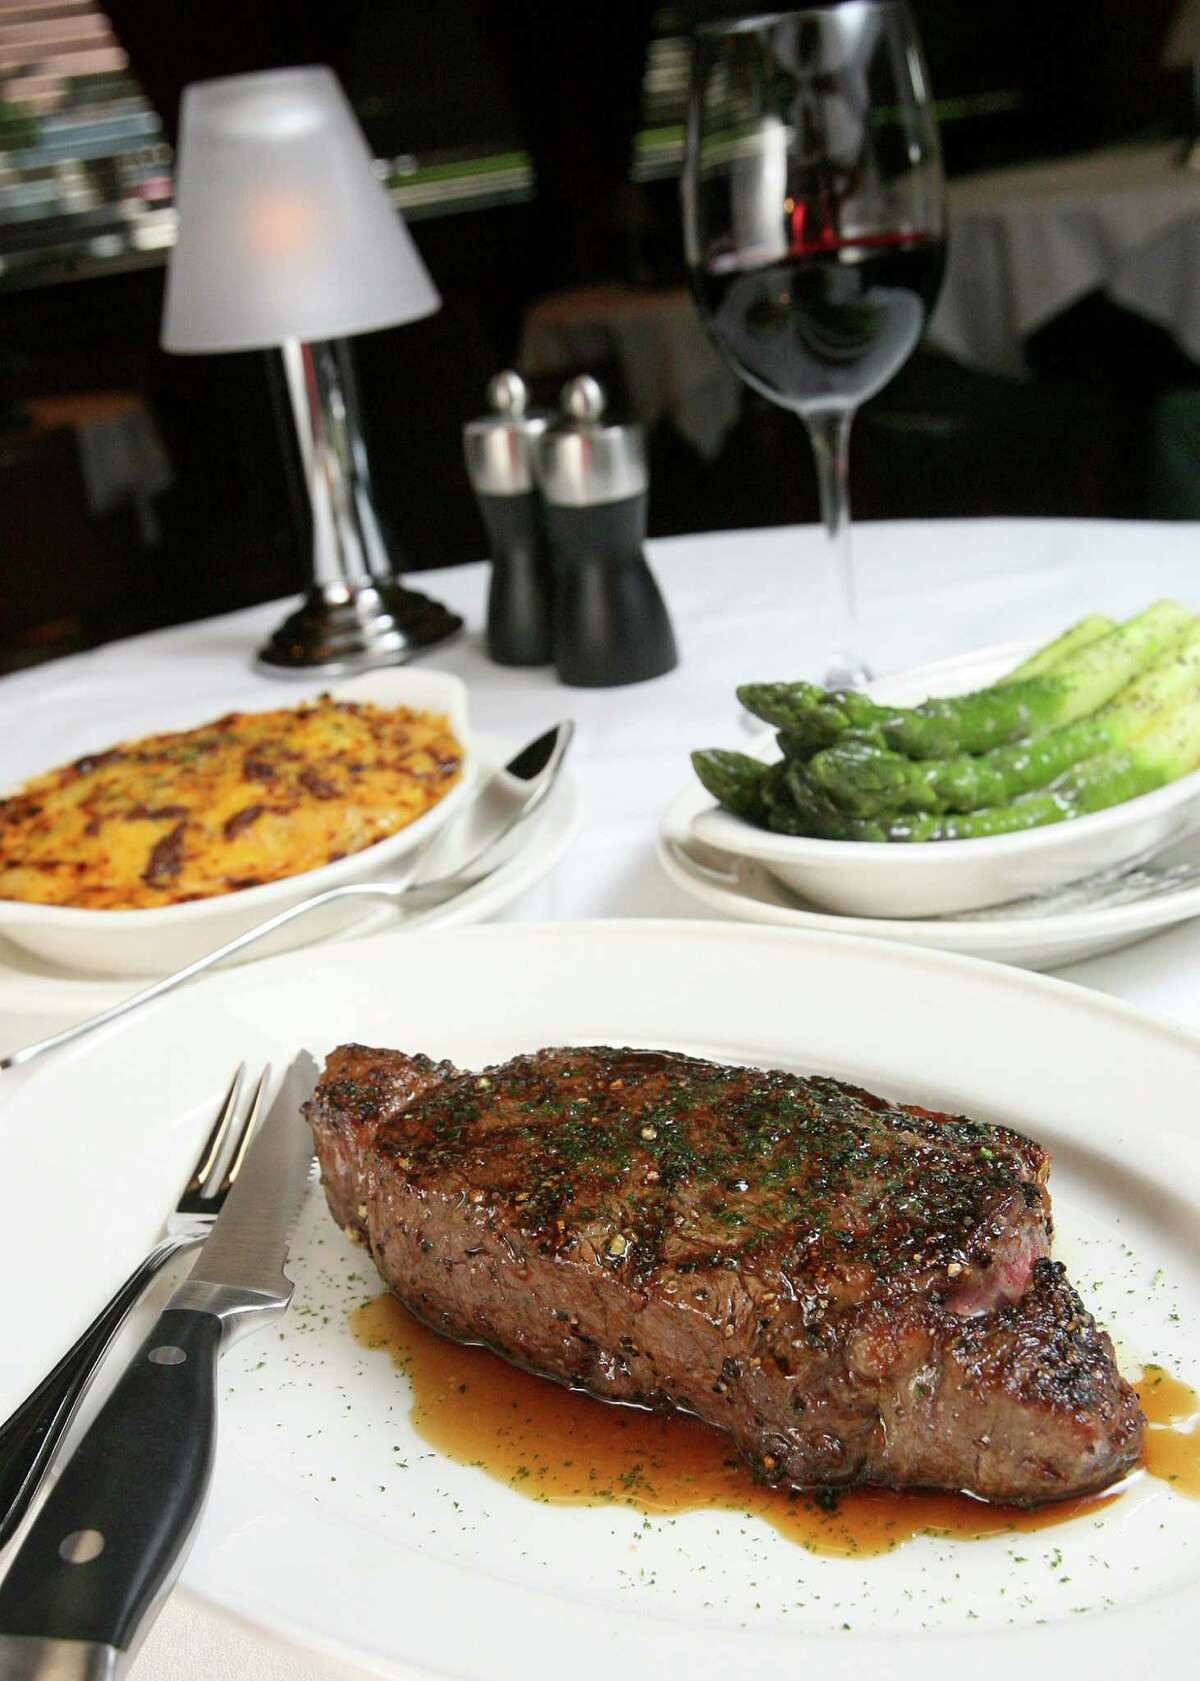 Pappas Bros Steakhouse 5839 Westheimer Rd., 713-780-7352